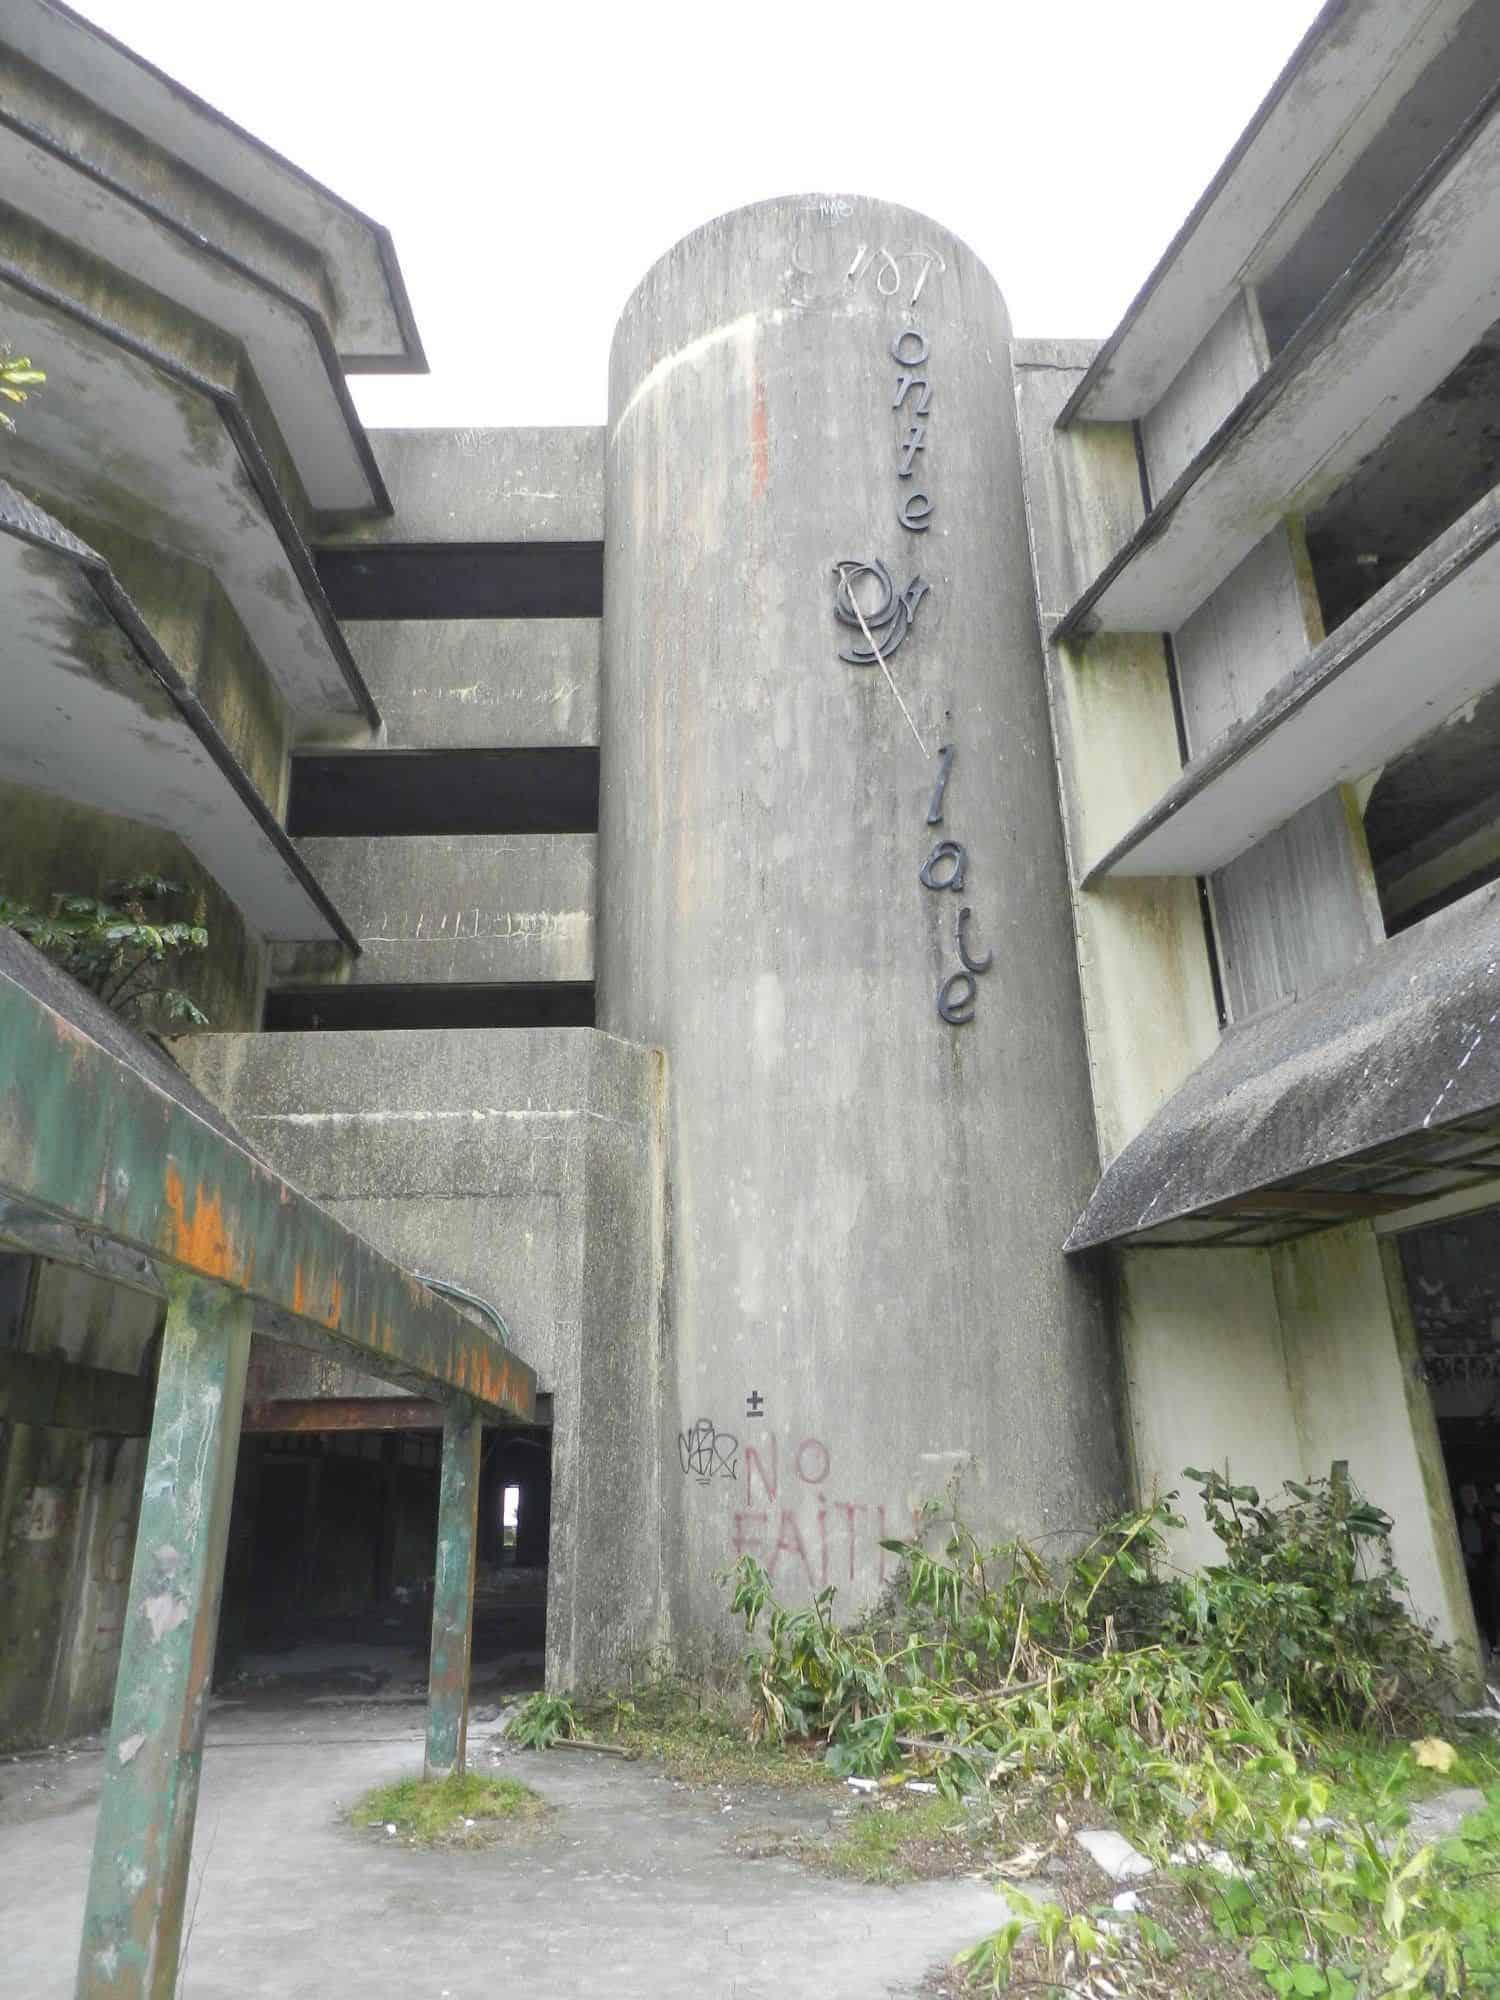 Hotel abandonné Açores